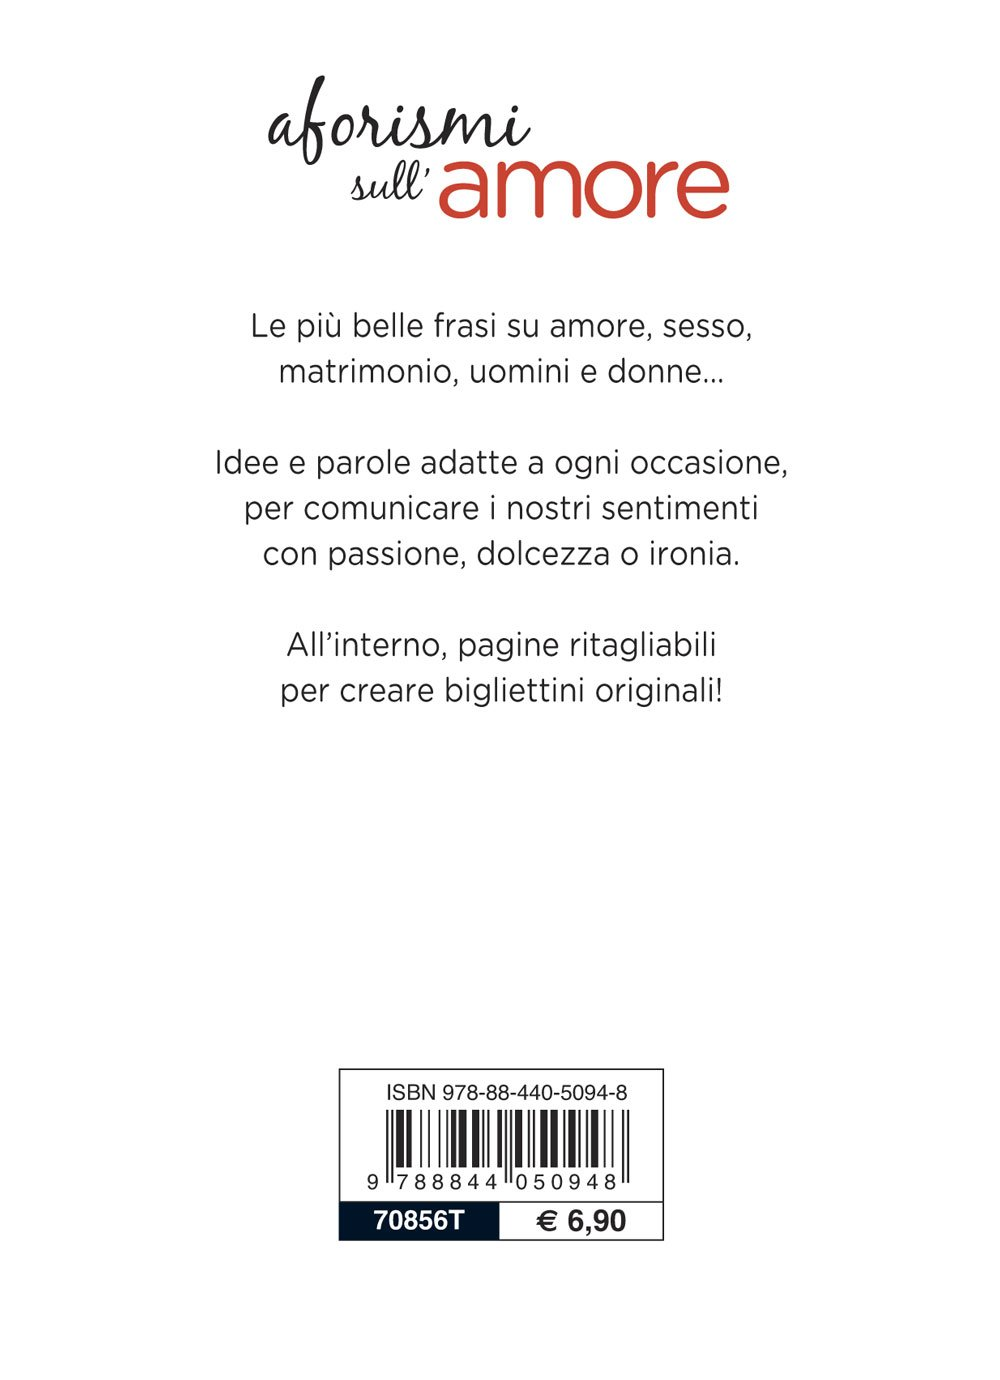 Frasi Amore Matrimonio.Aforismi Sull Amore 9788844050948 Amazon Com Books